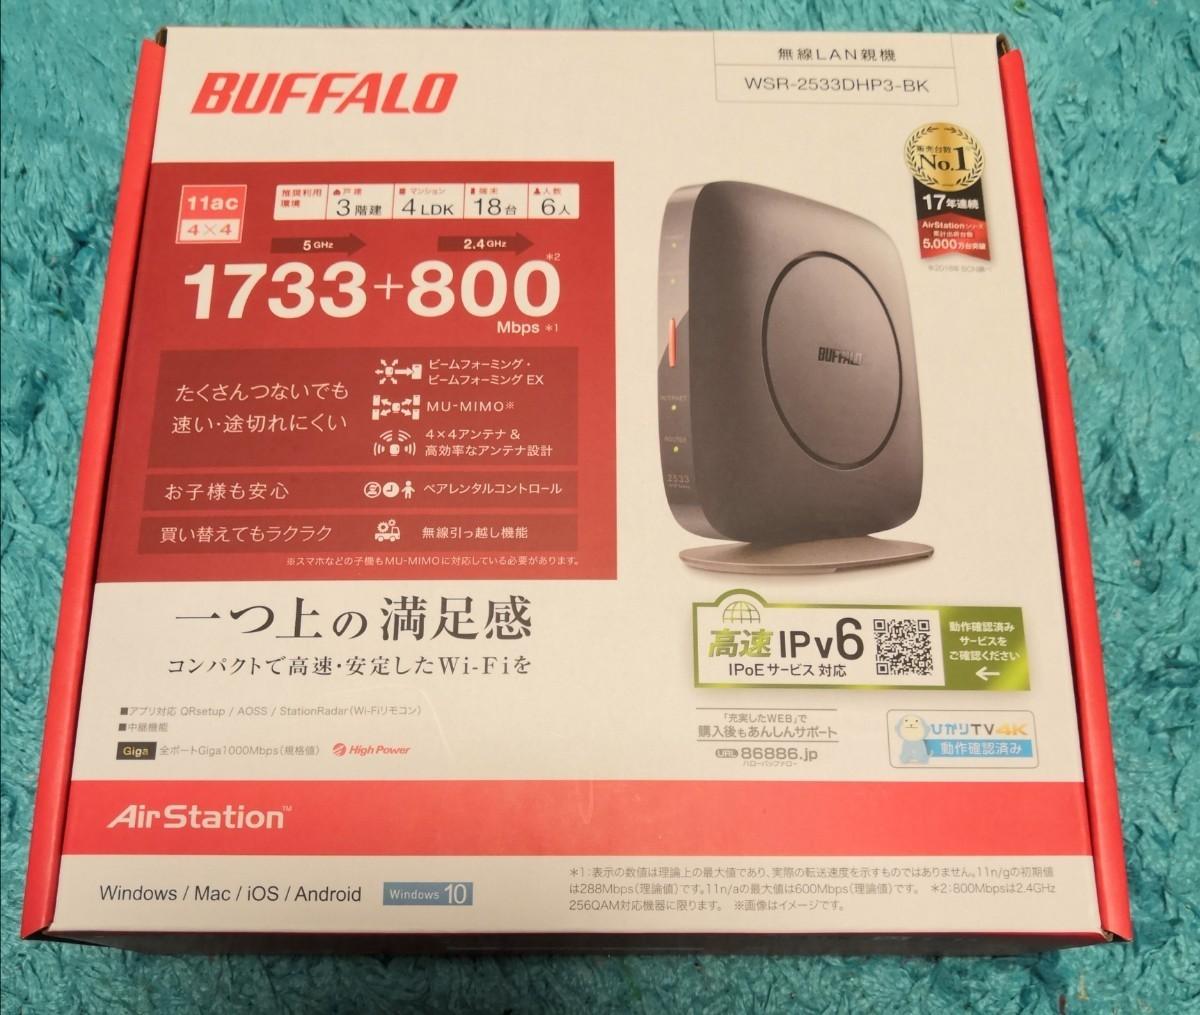 BUFFALO WSR-2533DHP3-BK 無線LANルータ バッファロー